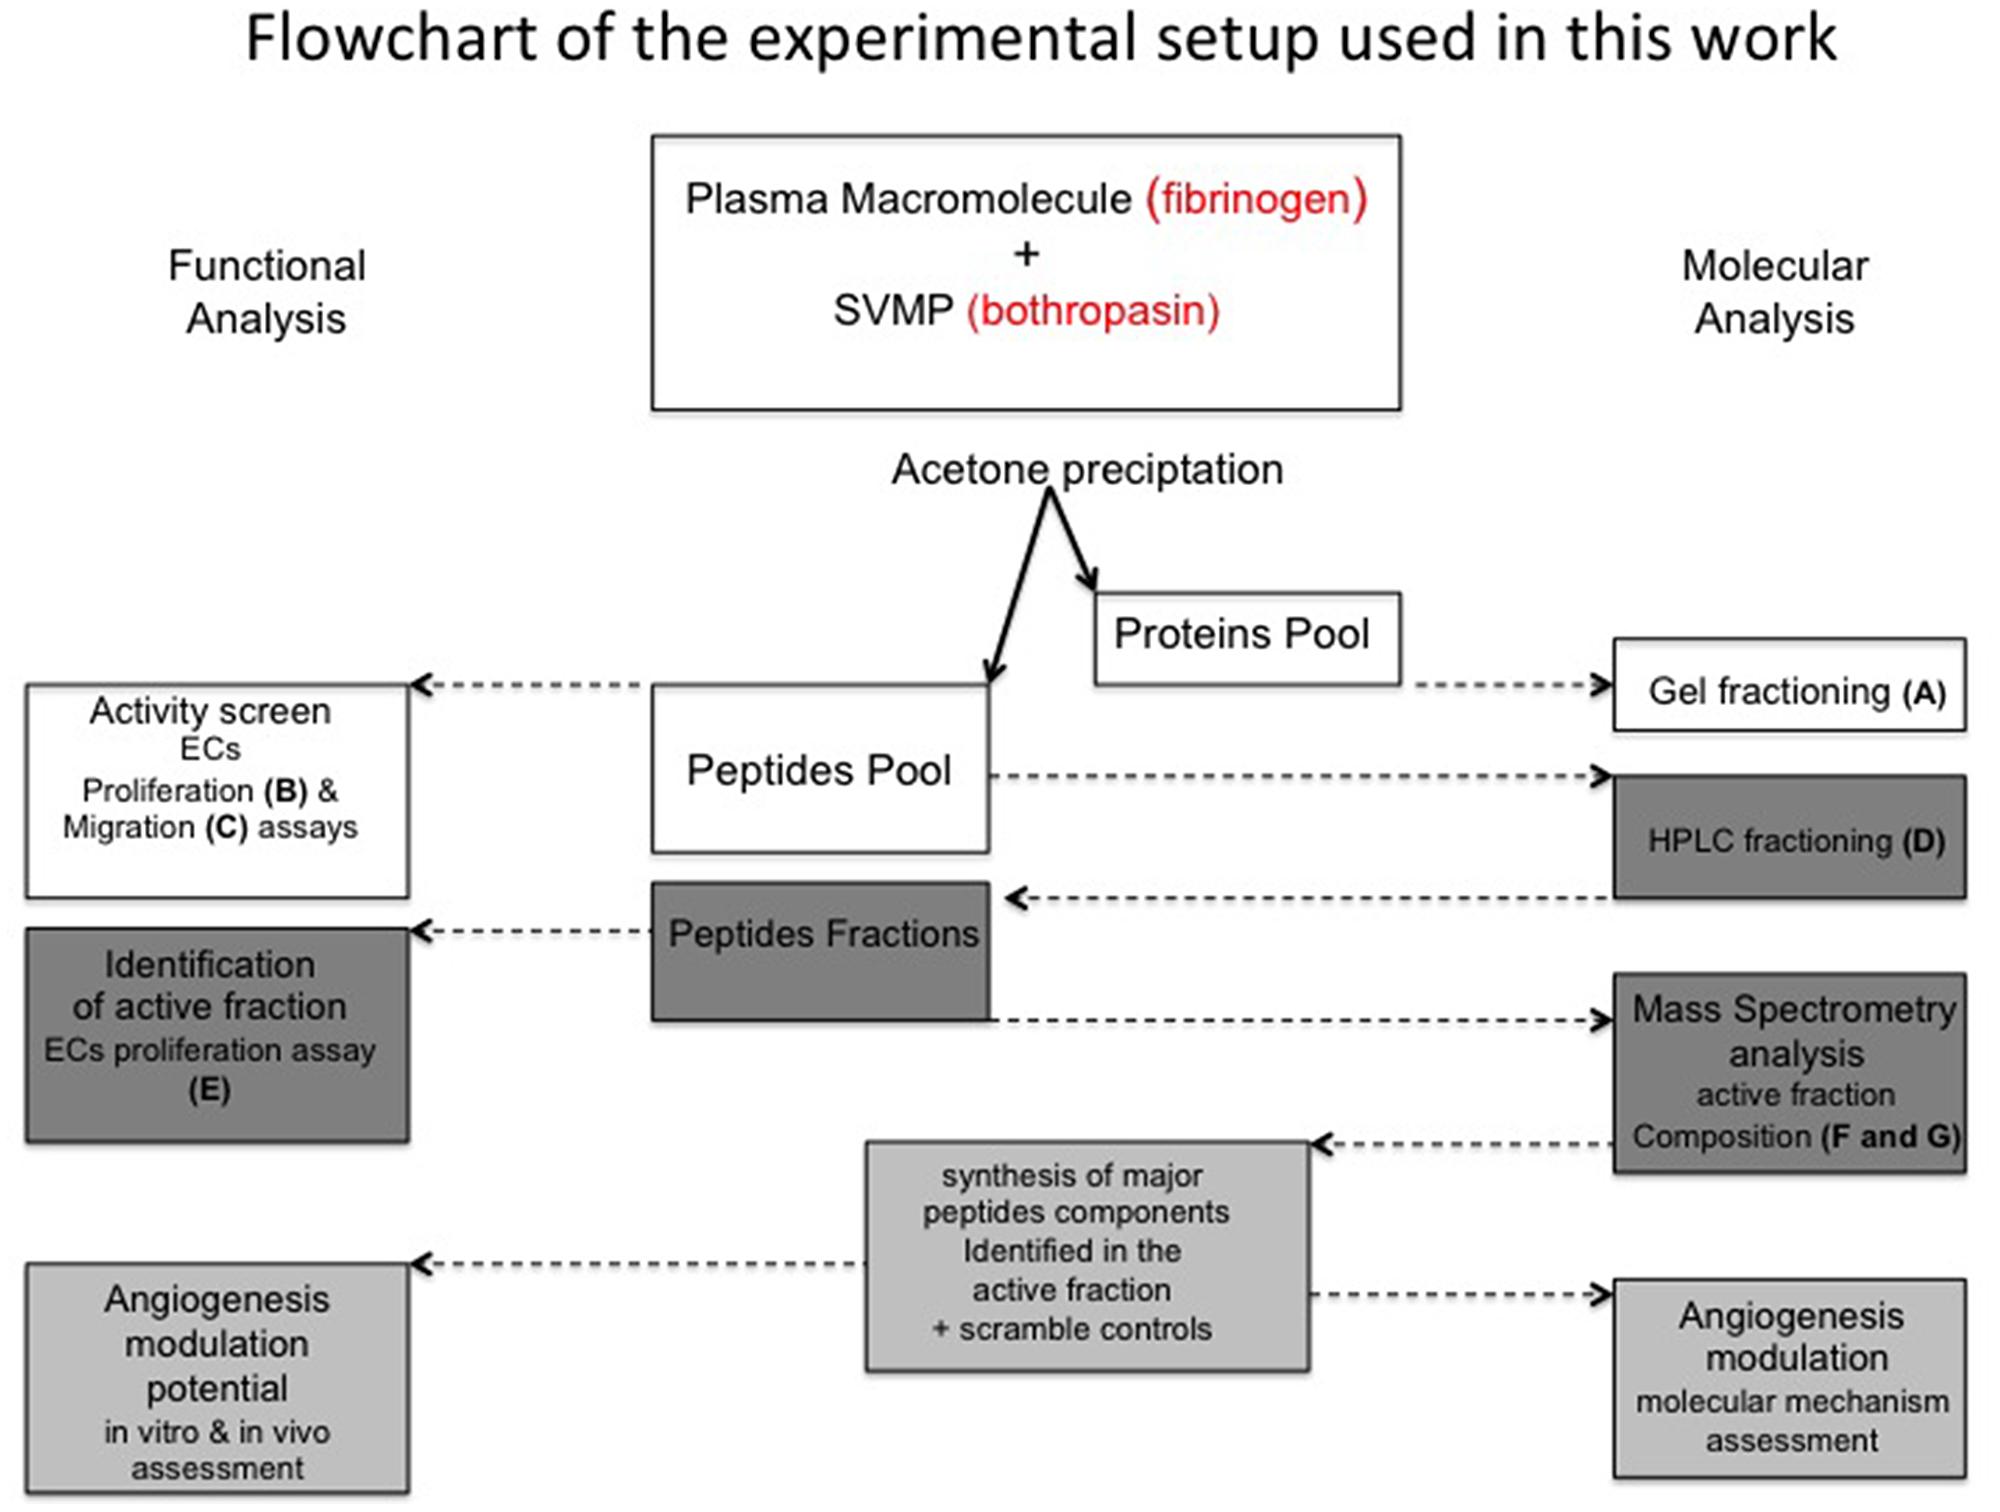 Flowchart of experimental procedures applied in this work.